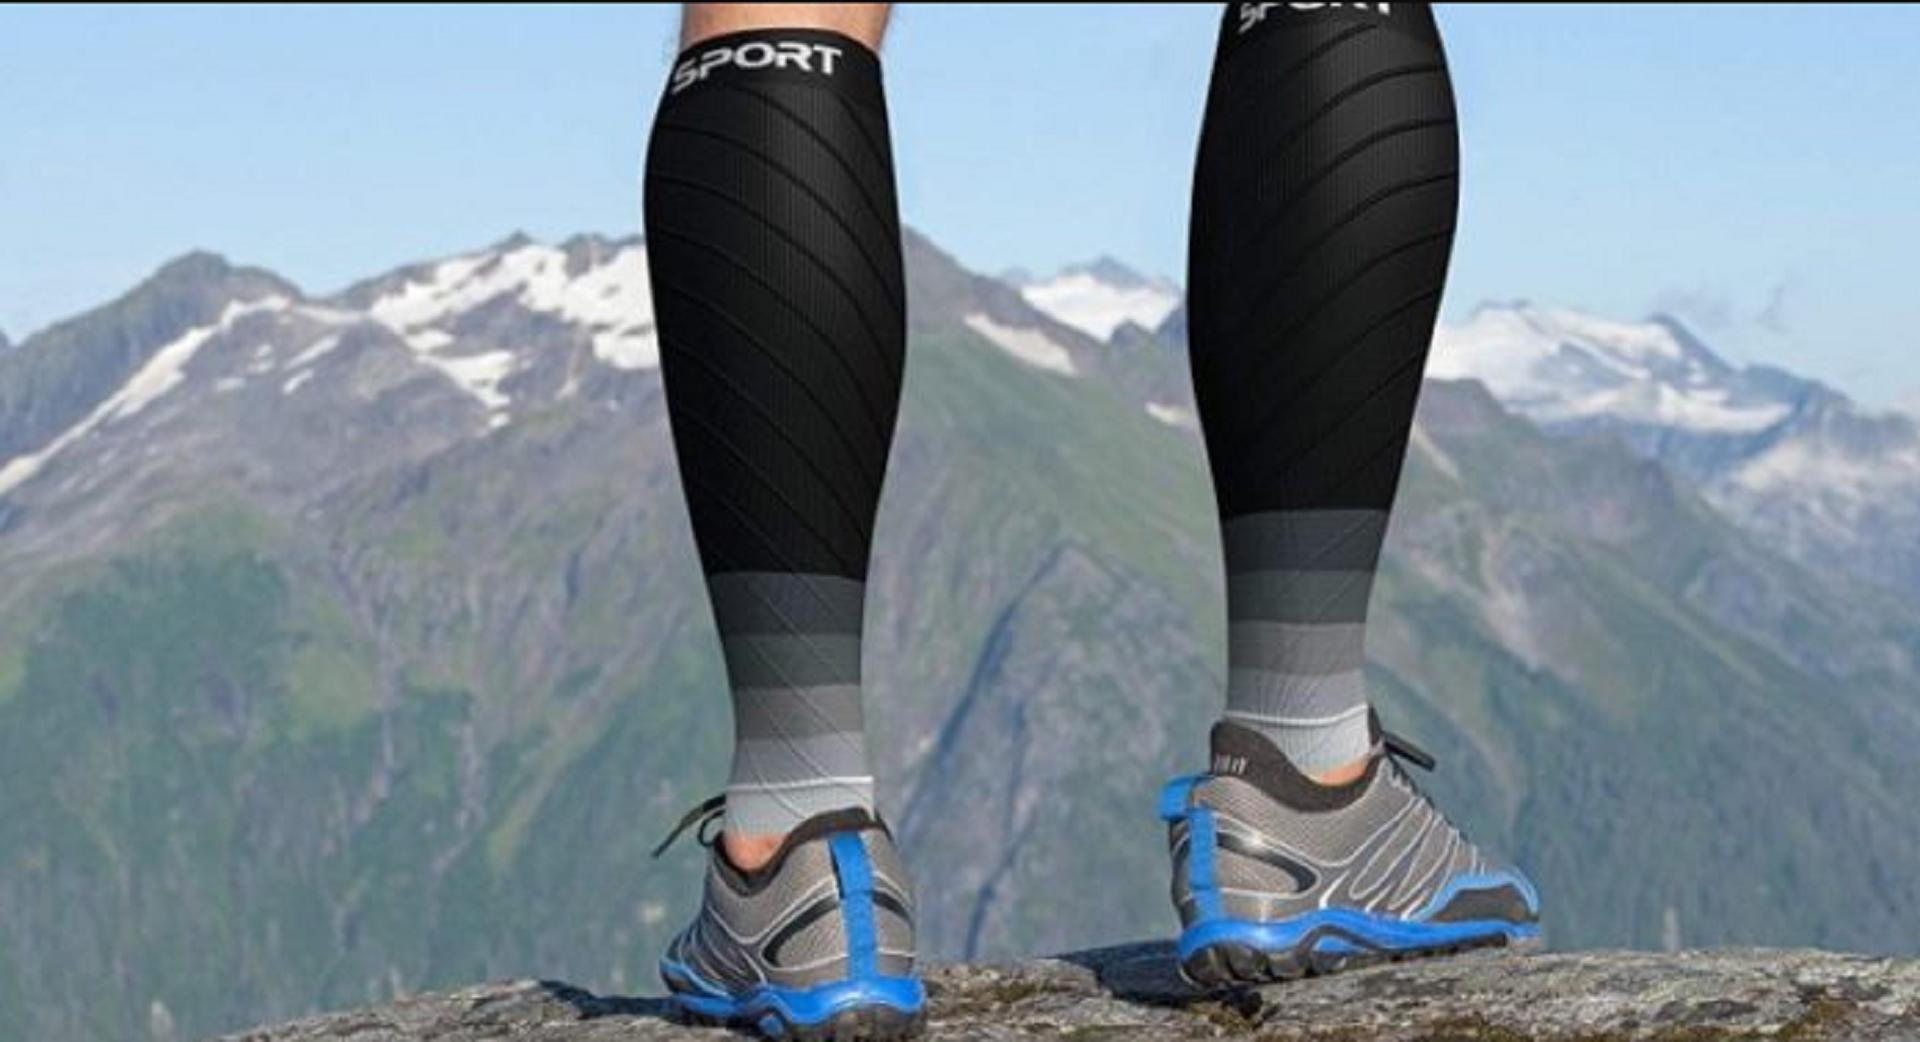 physix gear sport unisex calf sleeves